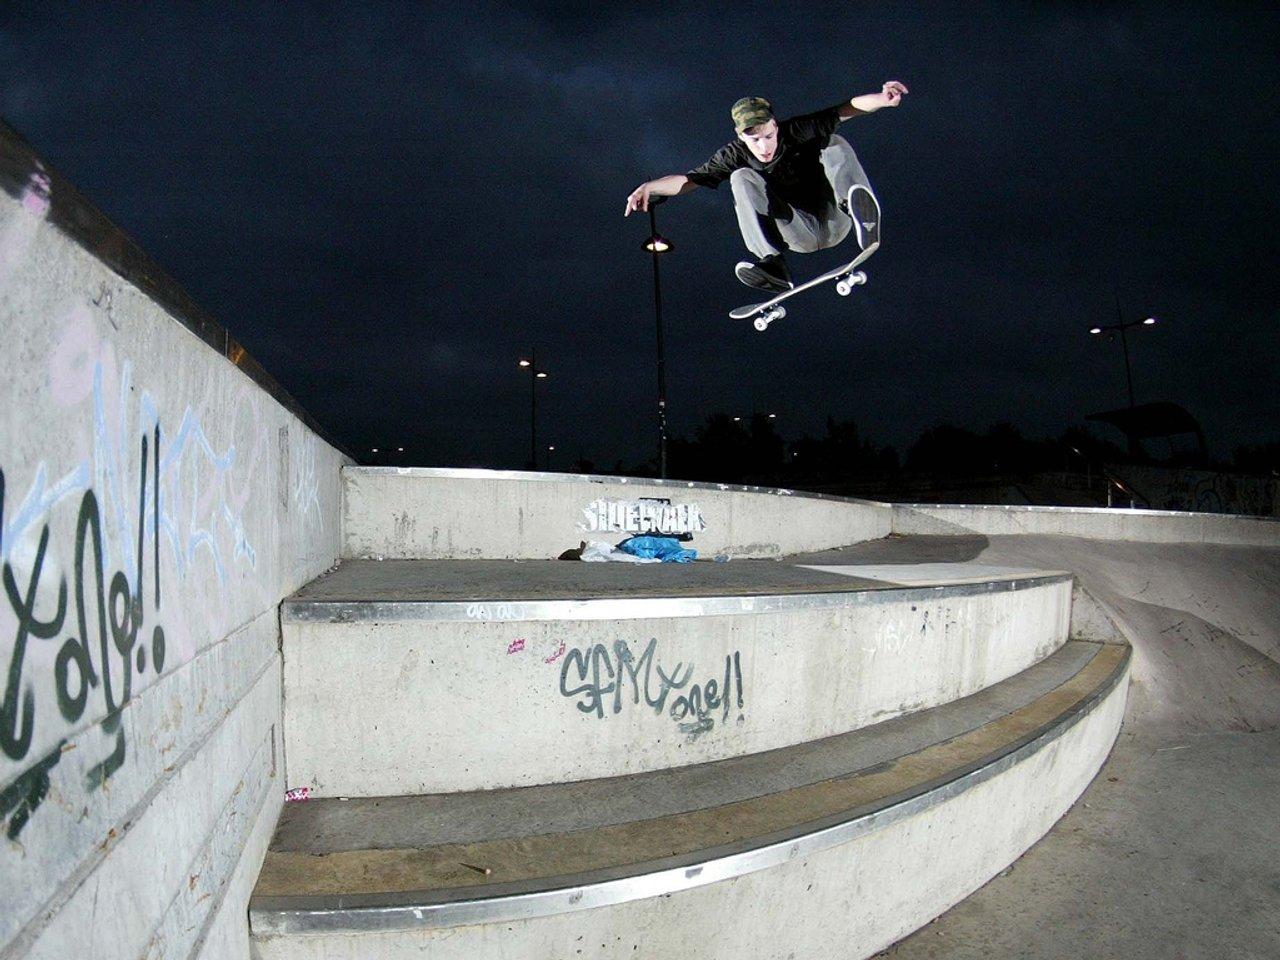 wallpapers hd for mac Skateboarding Wallpaper HD 1280x960